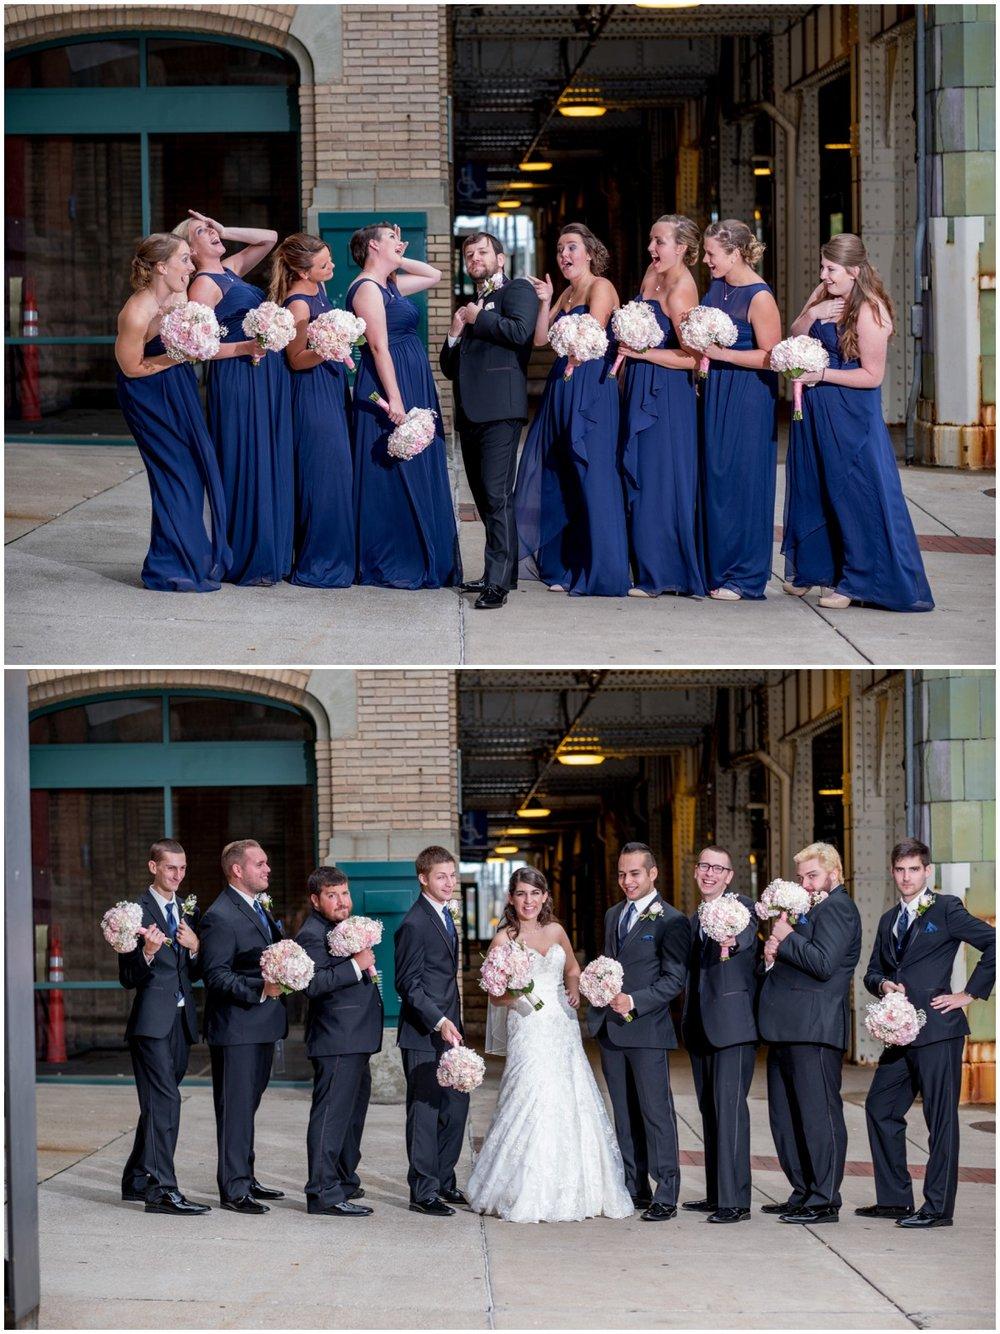 North-United-Methodist-Church-wedding-pictures_0008.jpg